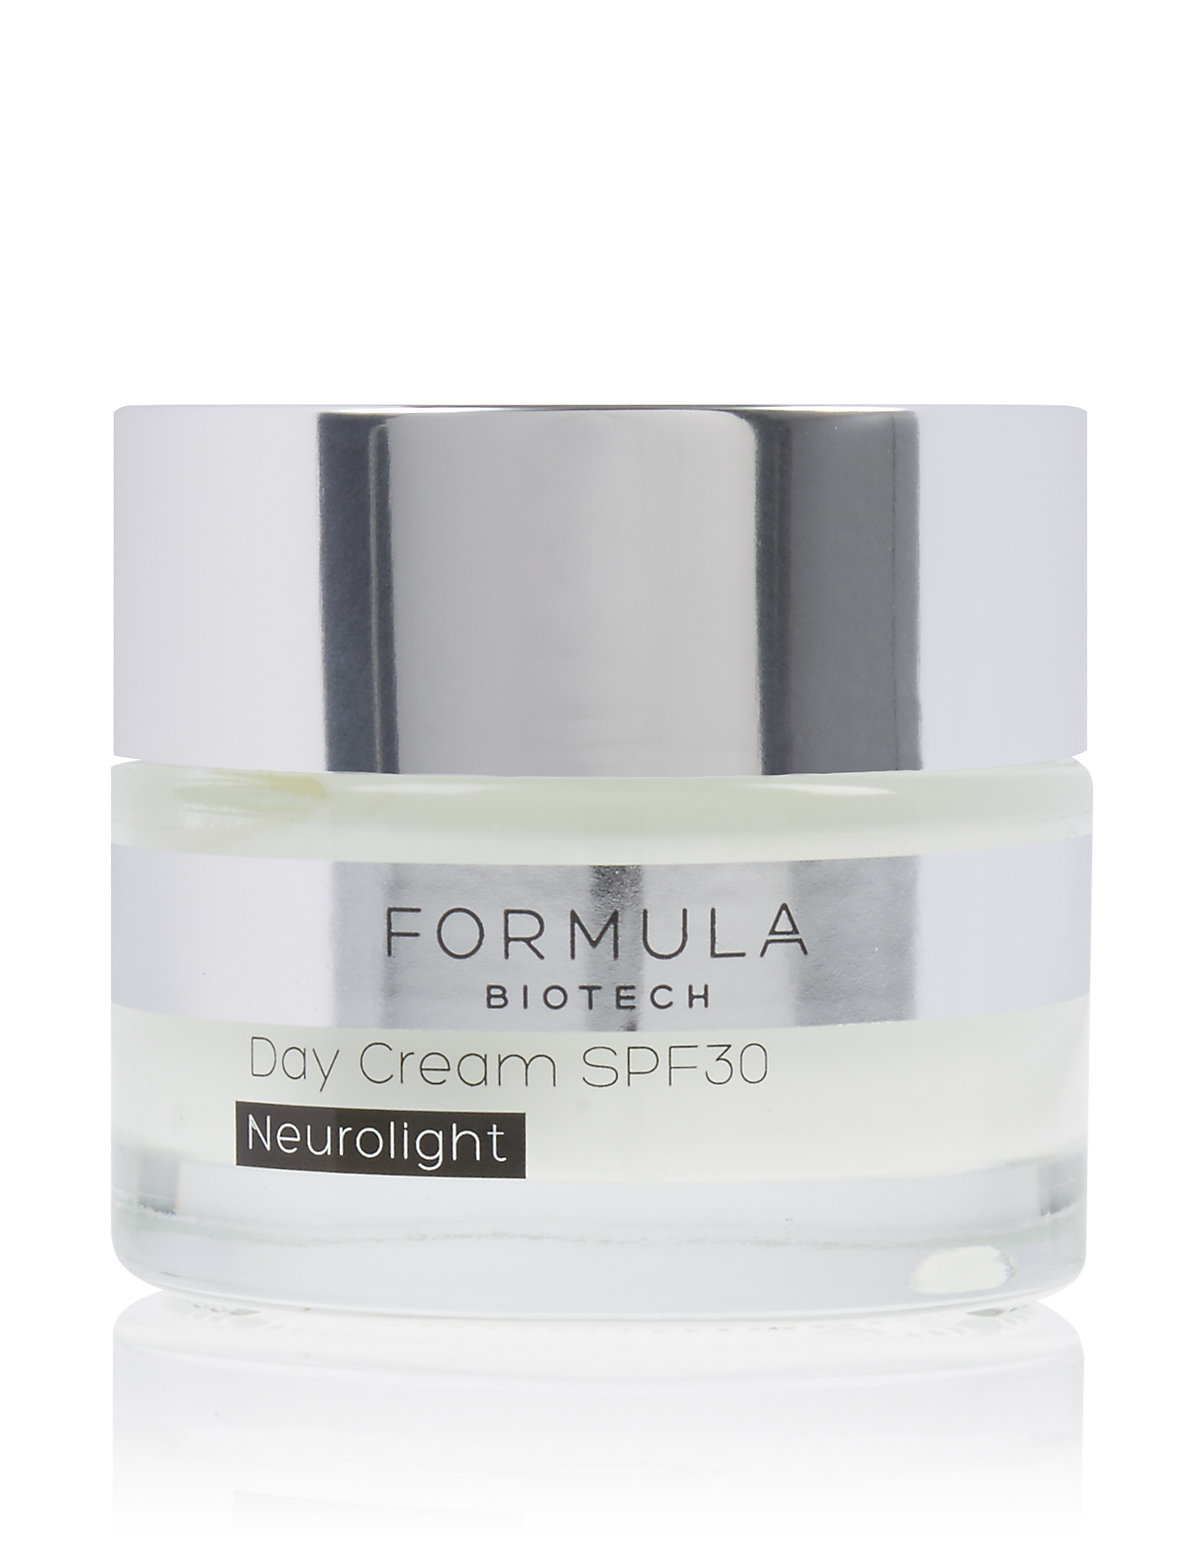 Formula Biotech Day Cream SPF 30 Neurolight Dark Spot Correcting 50ml